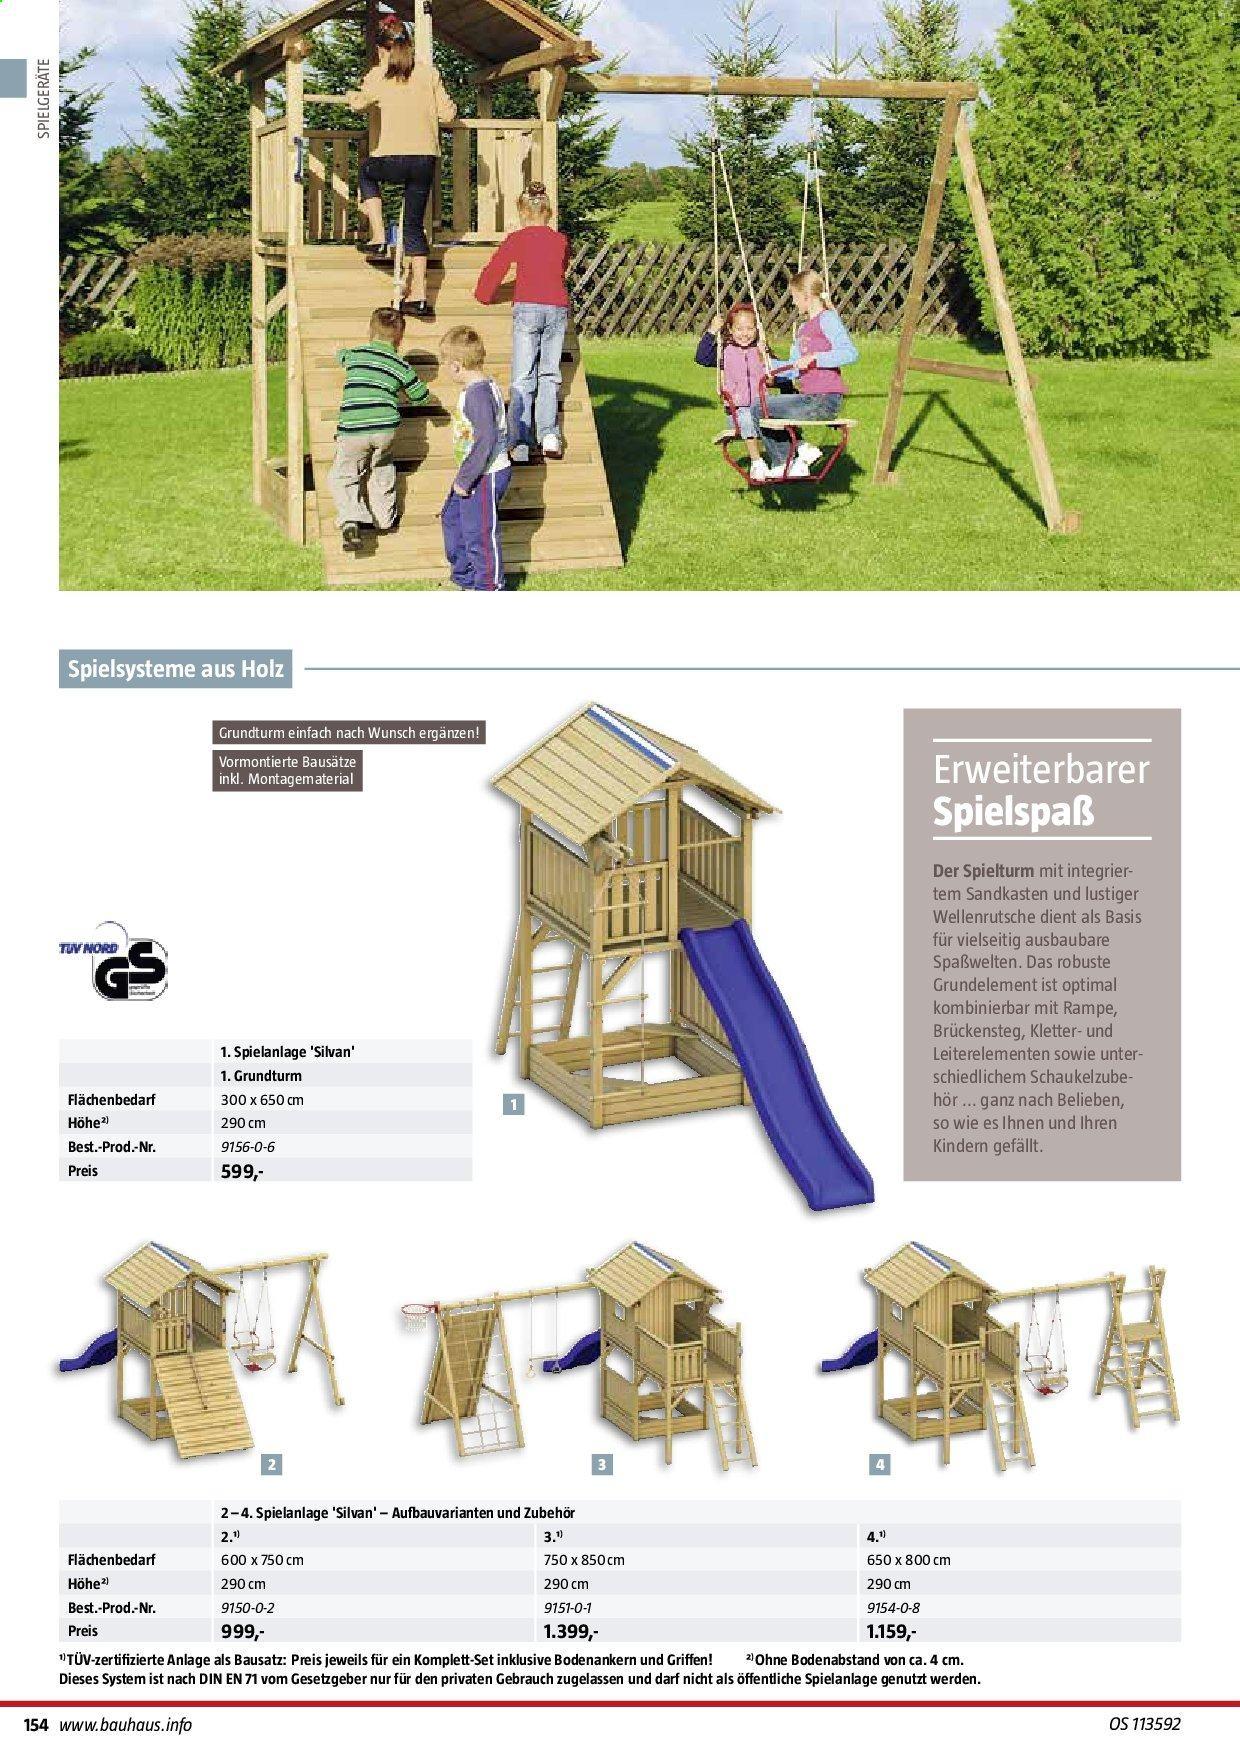 Full Size of Spielturm Bauhaus Kinderspielturm Garten Fenster Wohnzimmer Spielturm Bauhaus